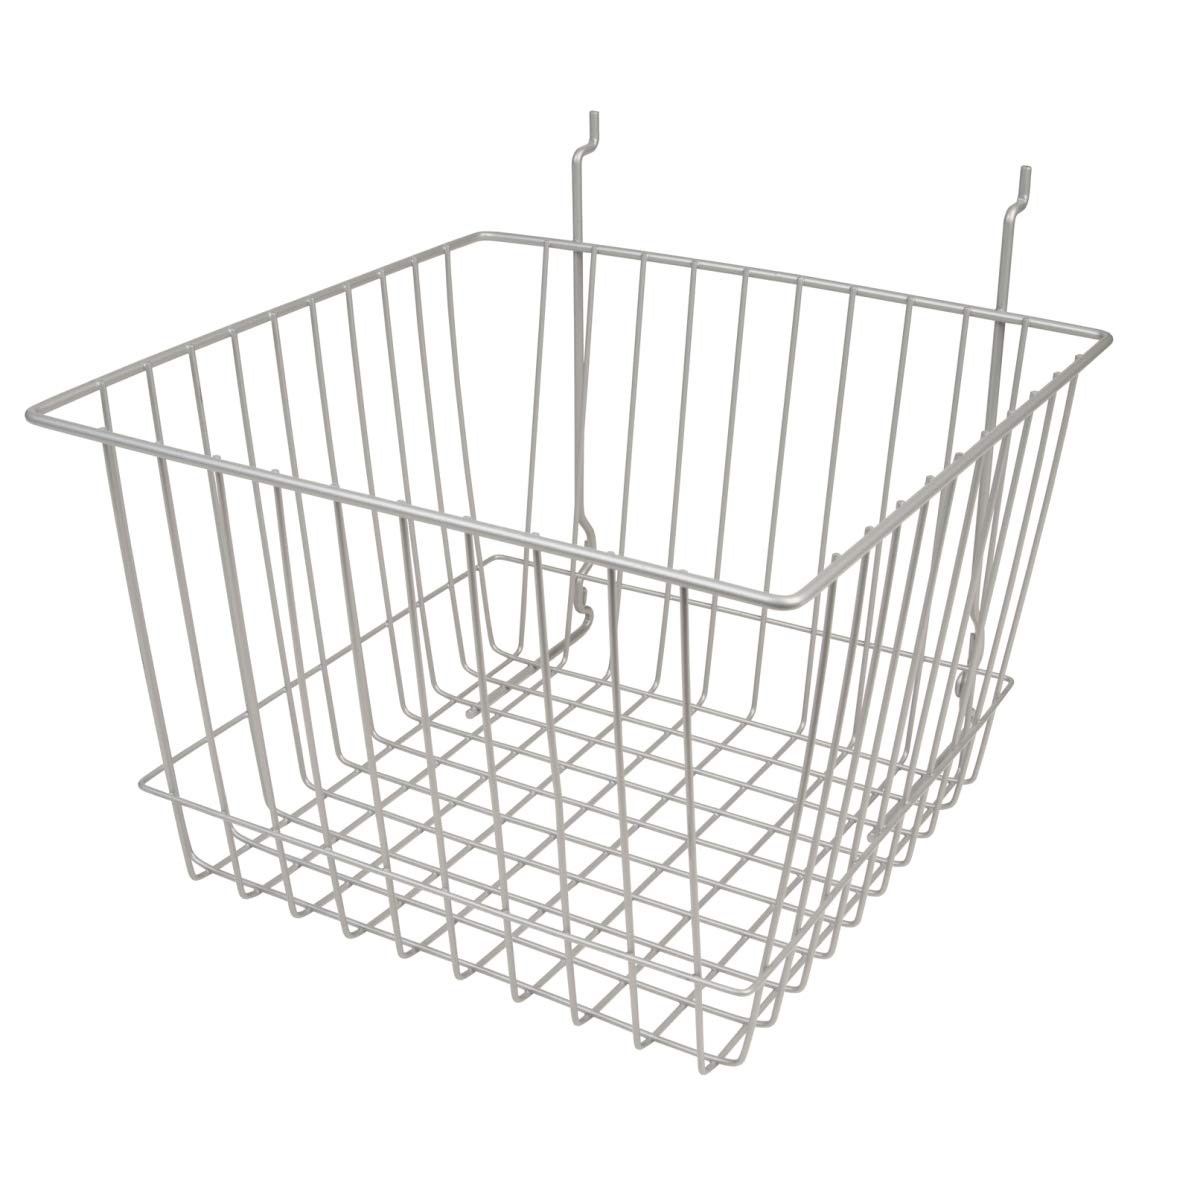 Econoco - Epoxy Chrome Multi-Fit 12'' Deep Wire Basket for Slatwall,  Pegboard or Gridwall (Set of 6) Metal Semi-Gloss Basket, Epoxy Chrome